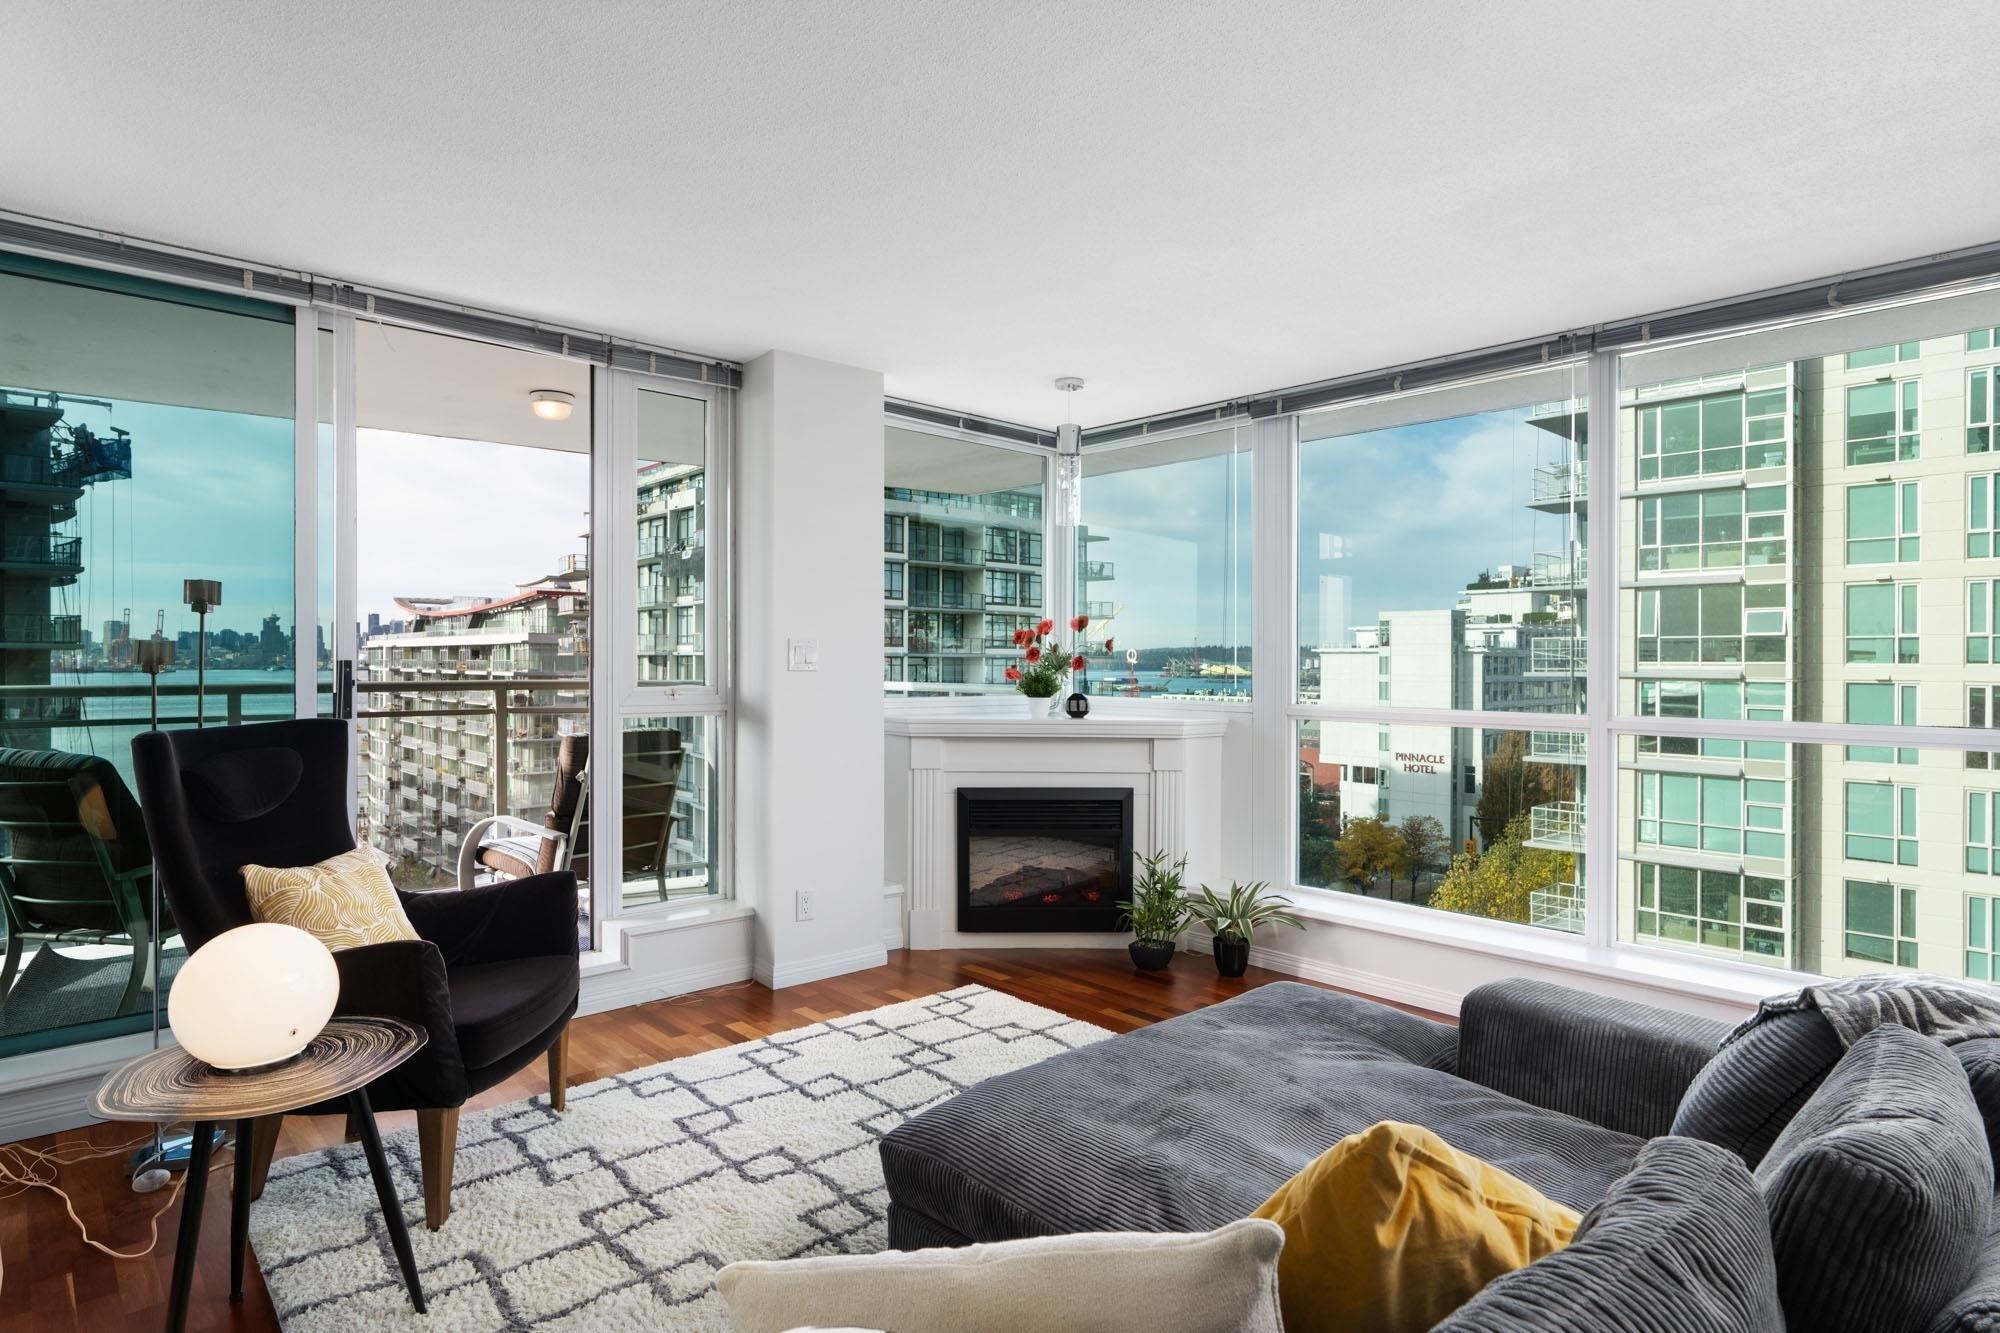 806 188 E ESPLANADE - Lower Lonsdale Apartment/Condo for sale, 2 Bedrooms (R2628019)